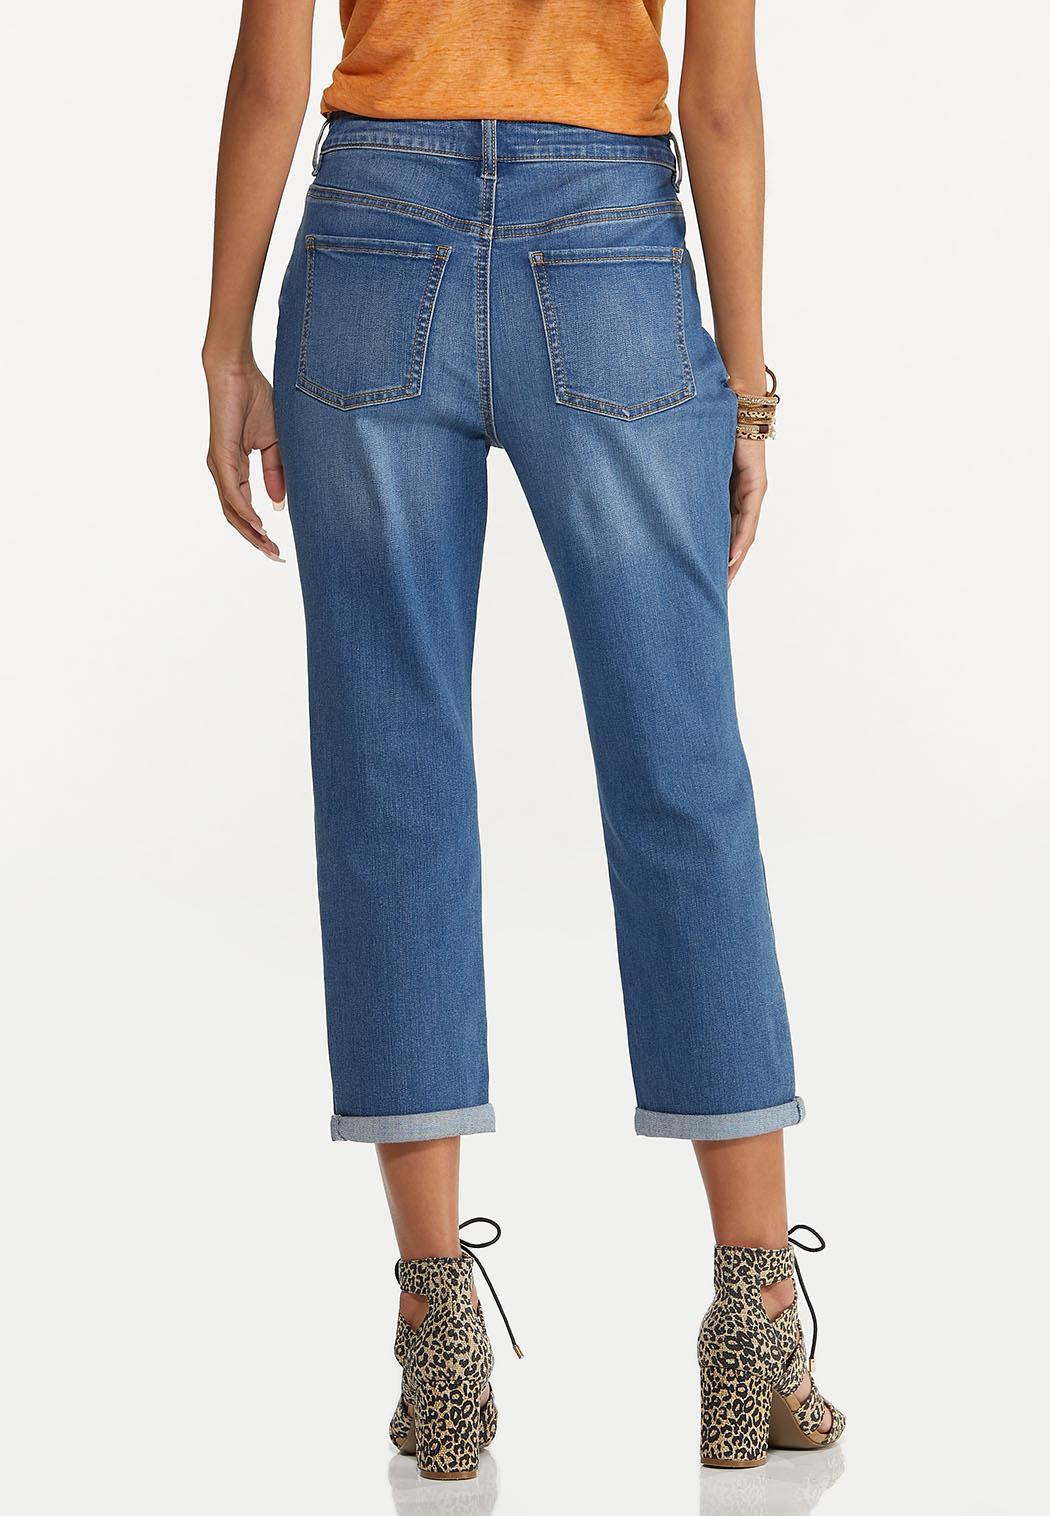 Cropped Distressed Boyfriend Jeans (Item #44627705)